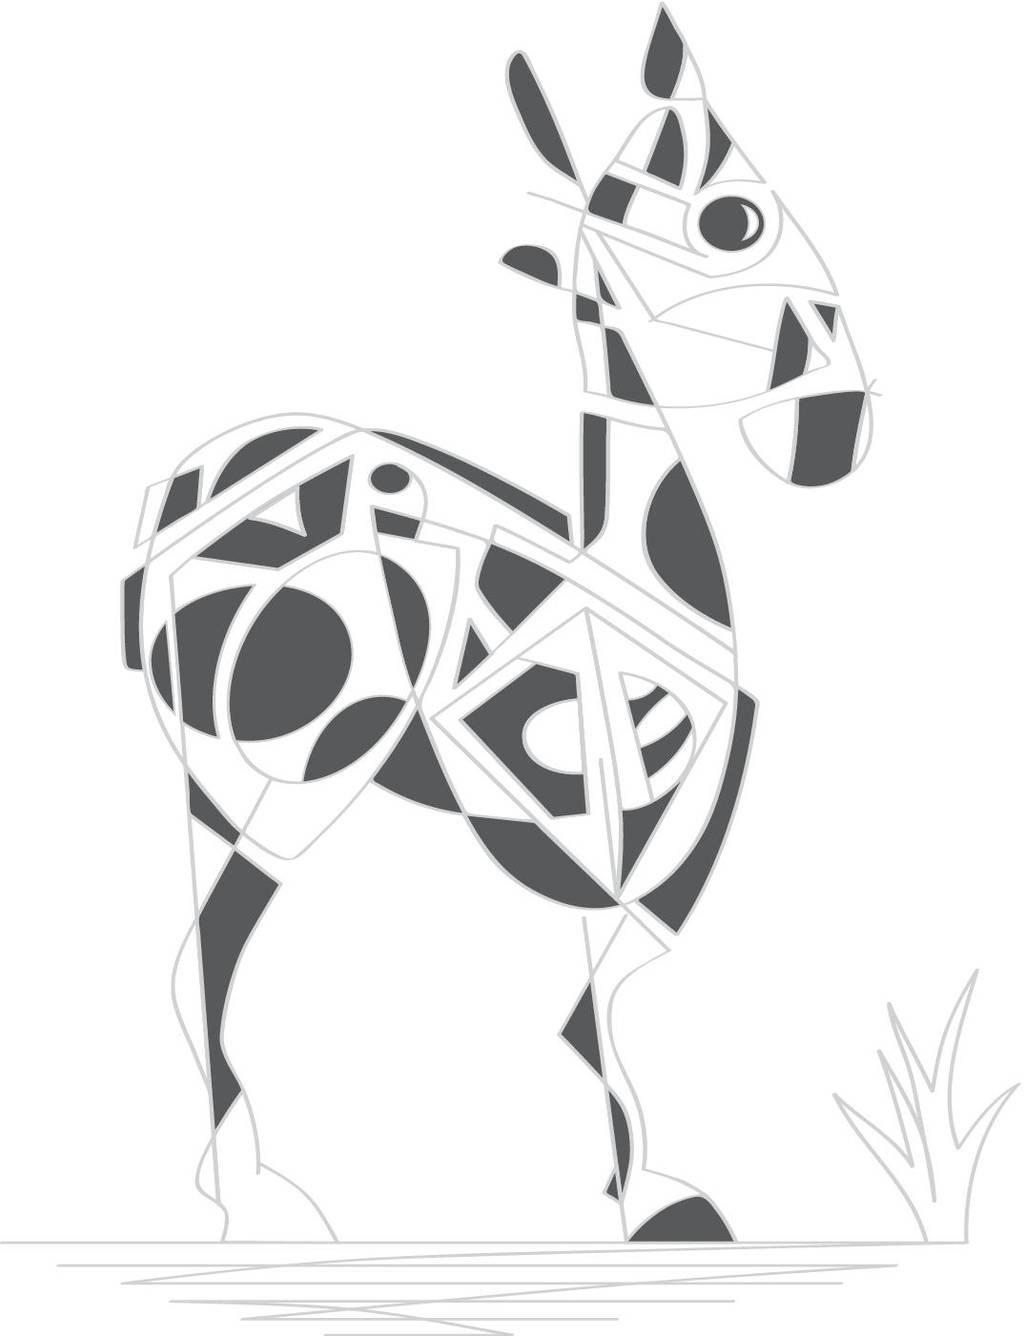 The Horse by zlajonja